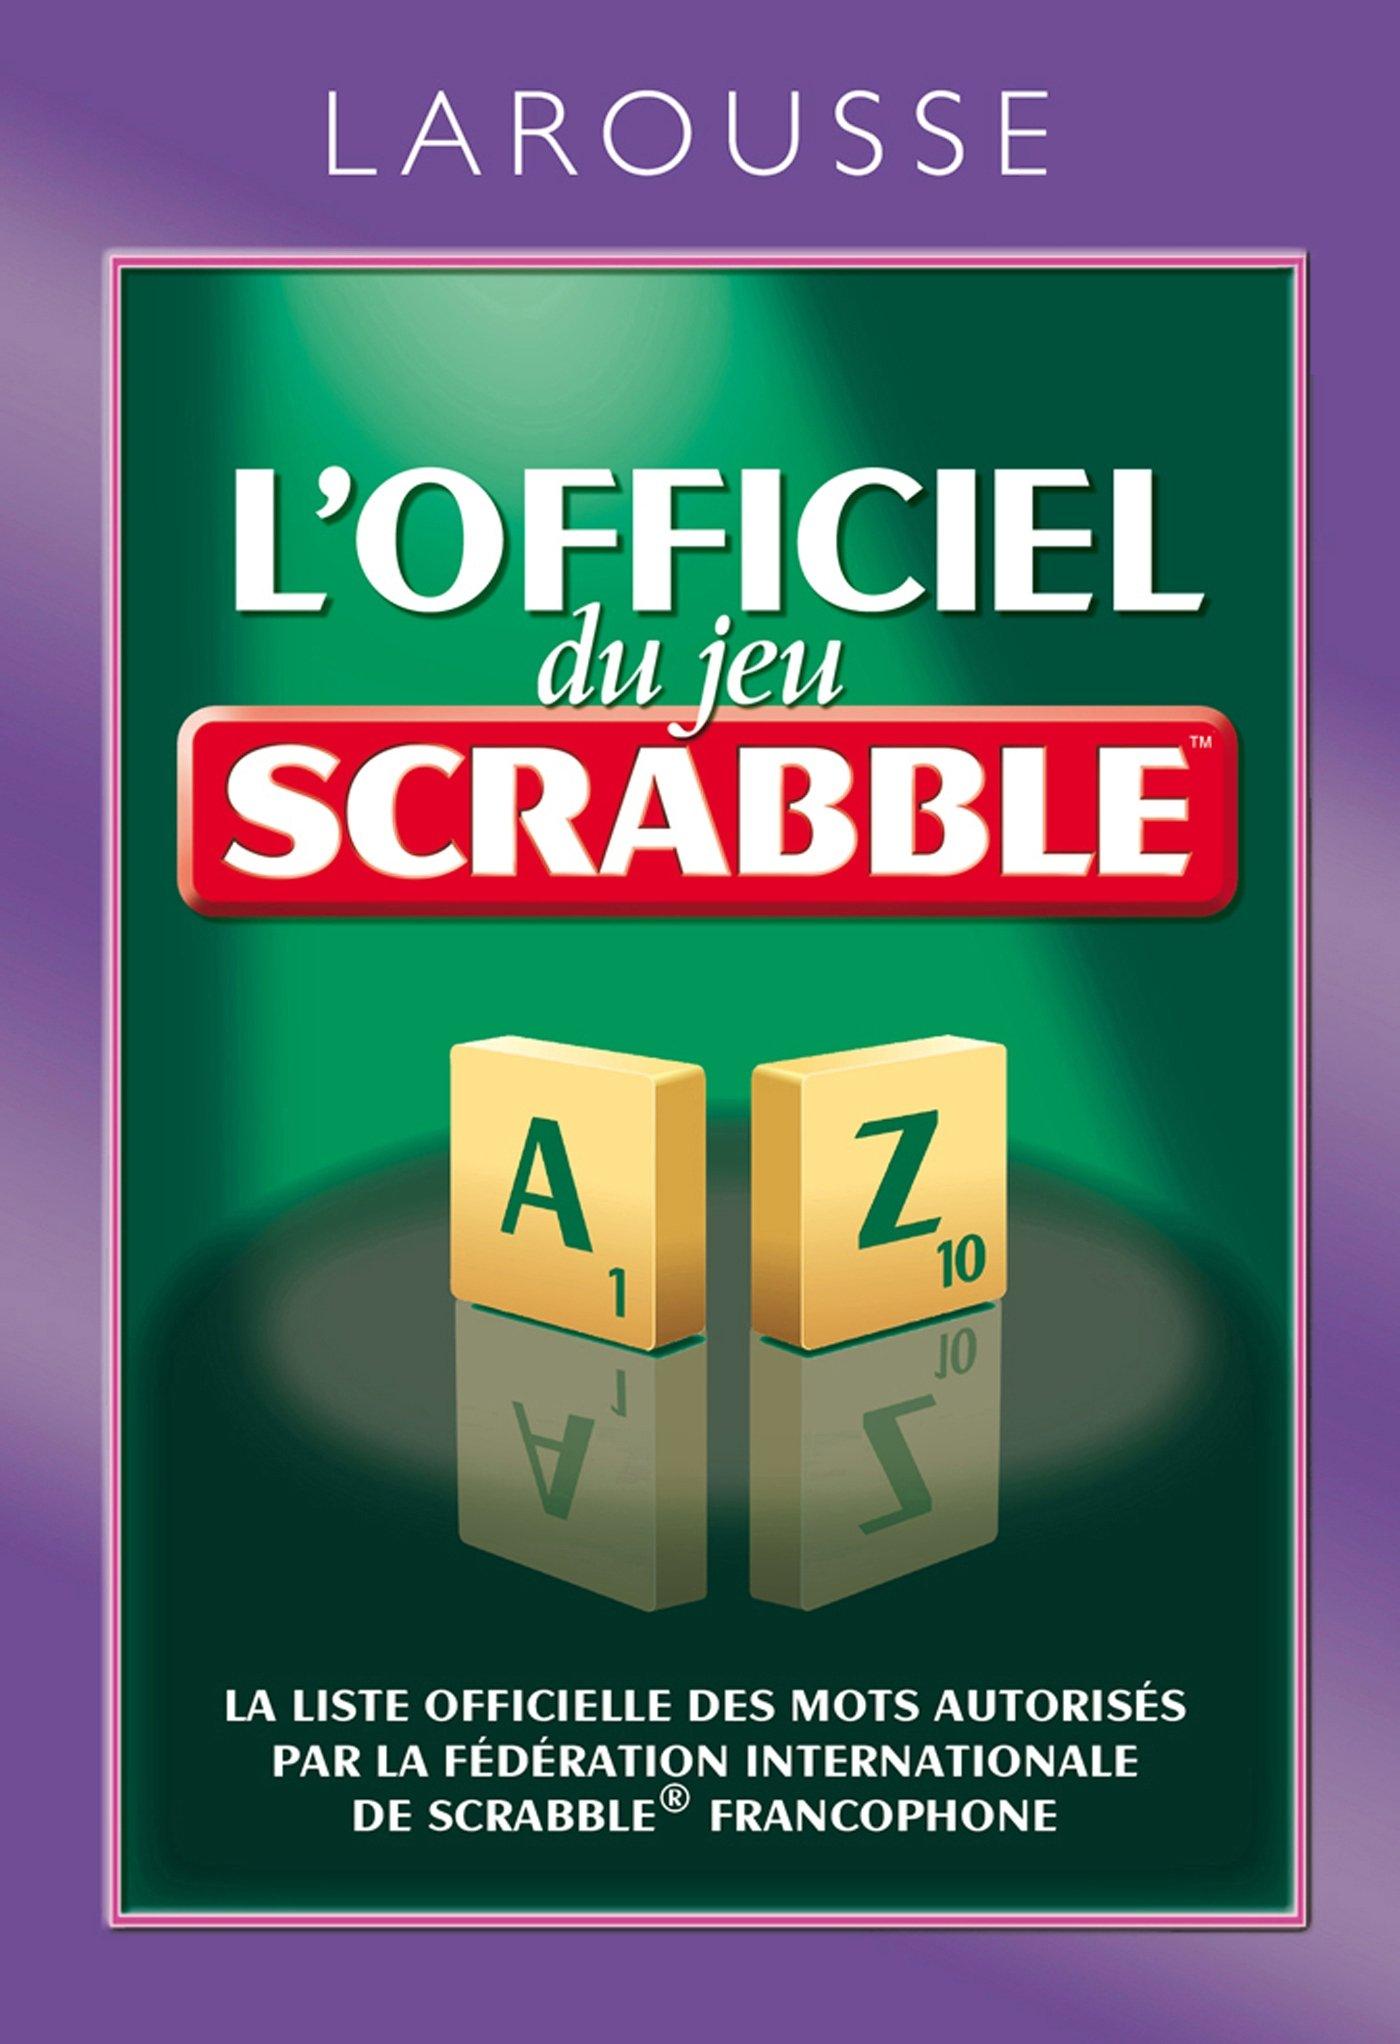 LOfficiel du Jeu Scrabble (Poche Larousse Pratique): Amazon.es: Collectif: Libros en idiomas extranjeros